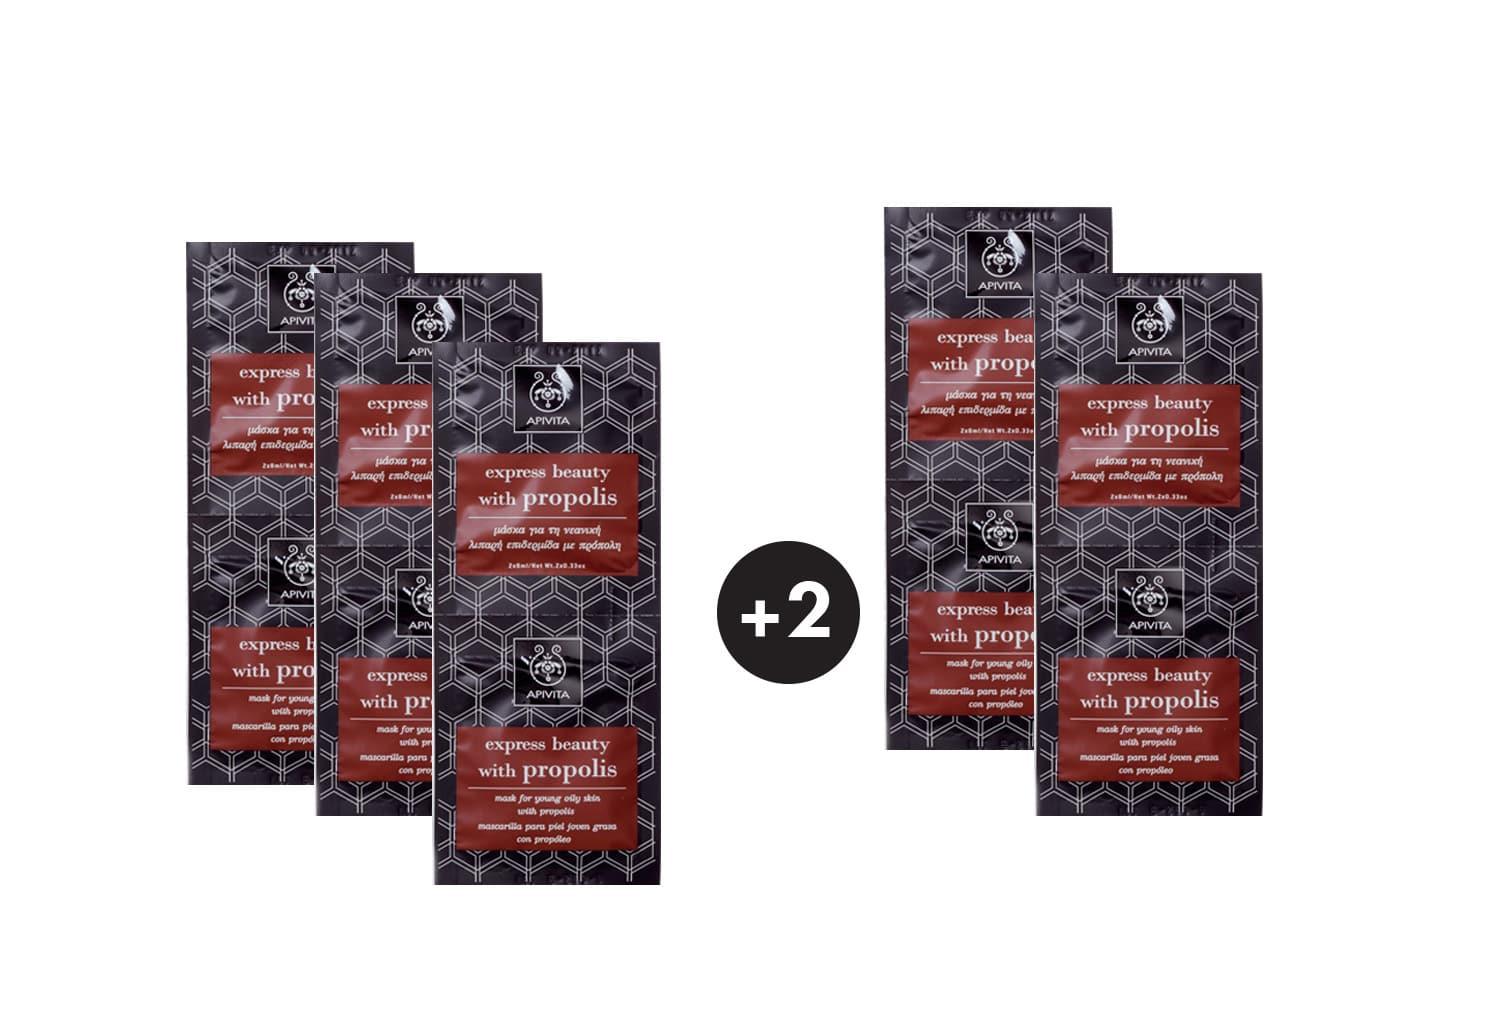 5 x Apivita Propolis Face Mask Express Beauty Μάσκα Καθαρισμού Προσώπου με πρόπολη (3+2 ΔΩΡΟ), 10 x 8ml